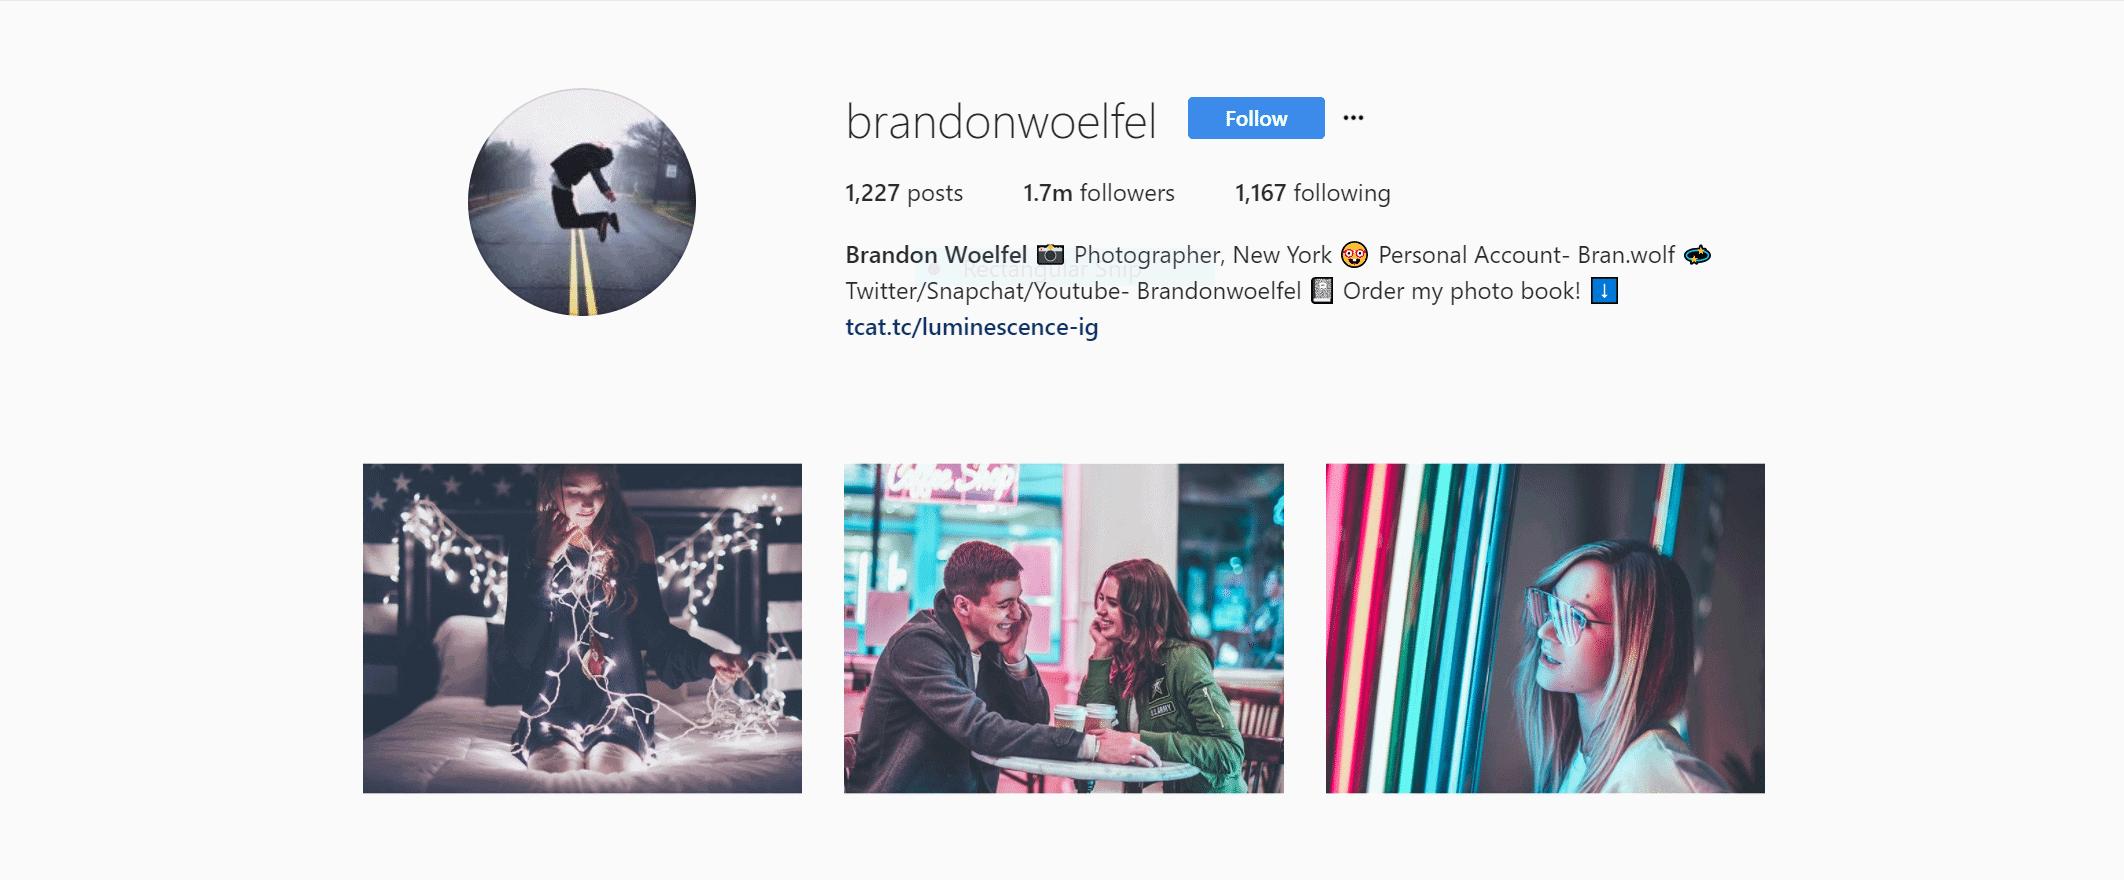 How To Get Verified On Instagram | Logic Inbound